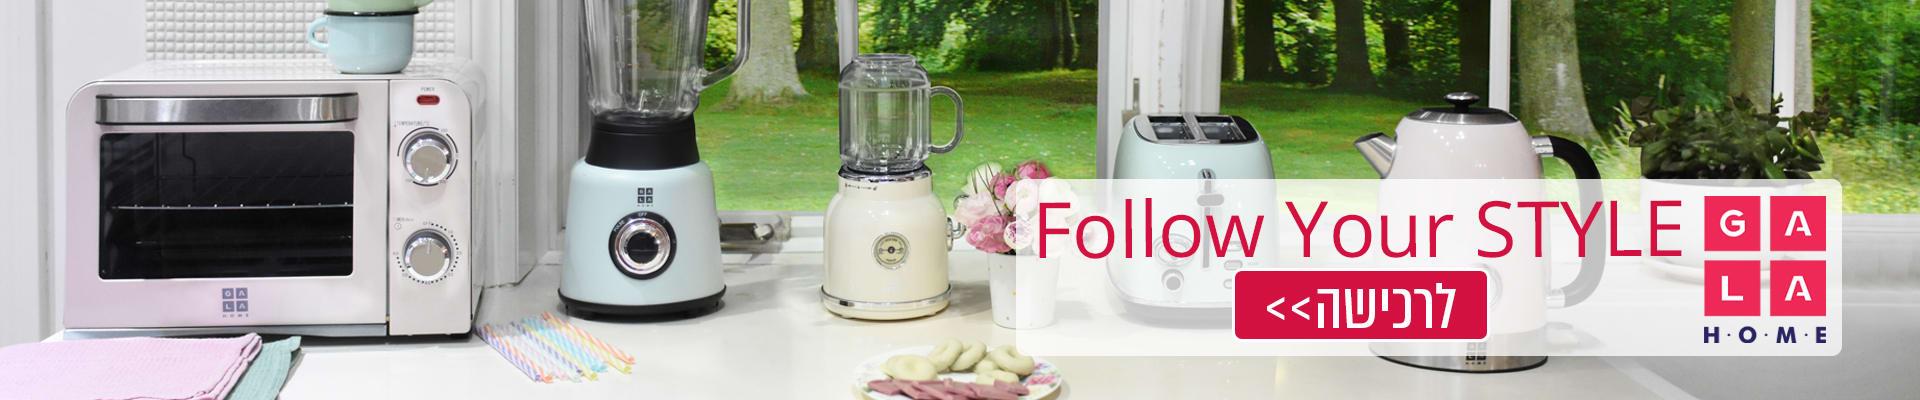 Follow your style GALA : קולקציית מוצרי חשמל רטרו